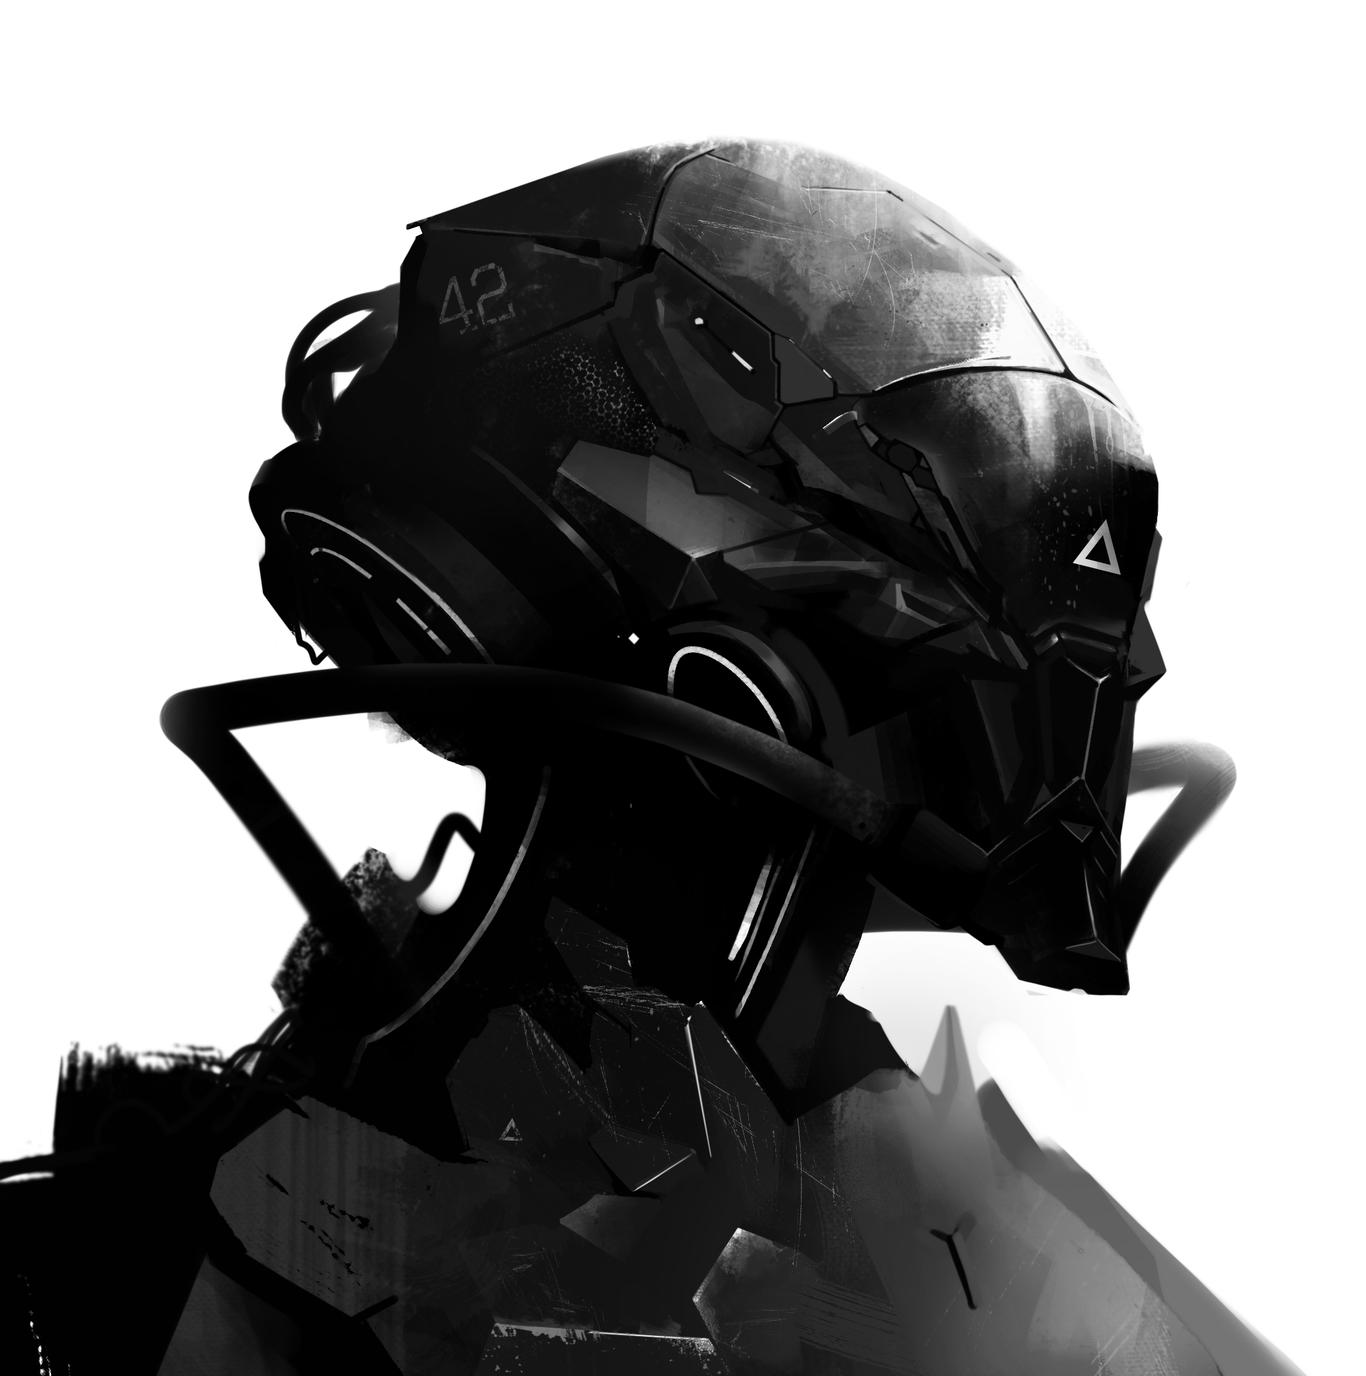 Karelinnikolay black robot 1 b820531b zcj6